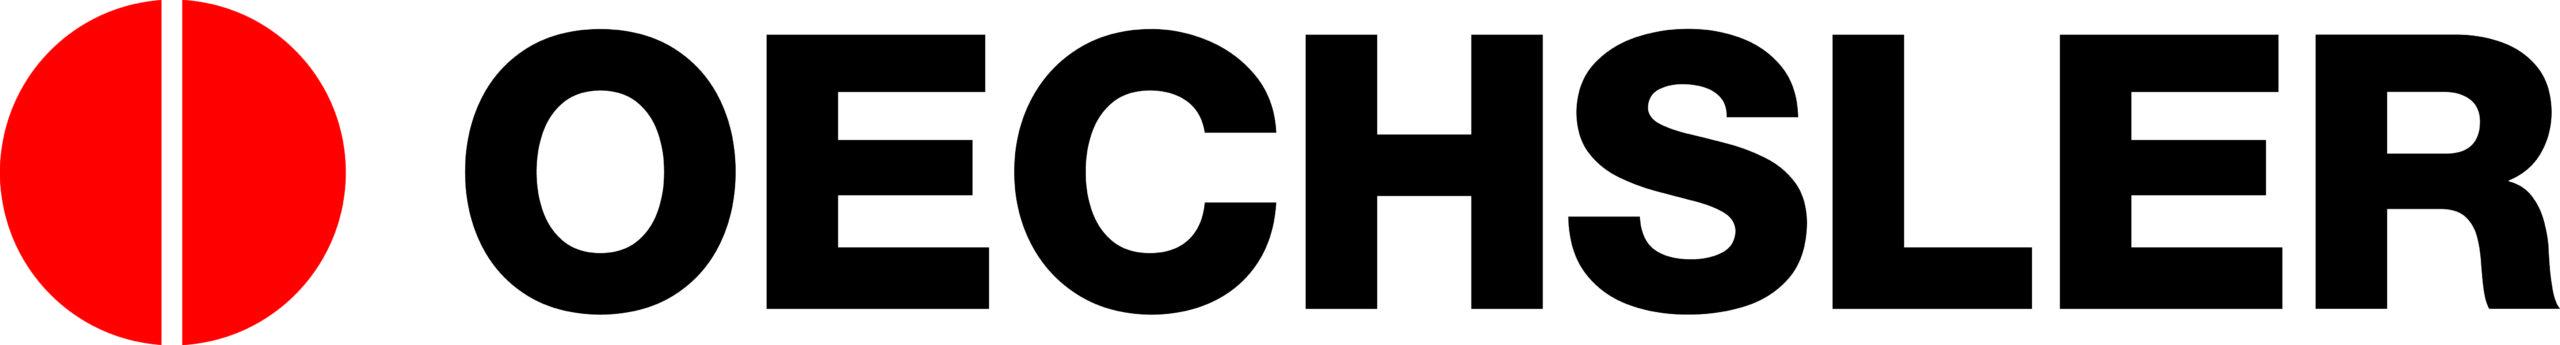 http://www.oechsler.com/